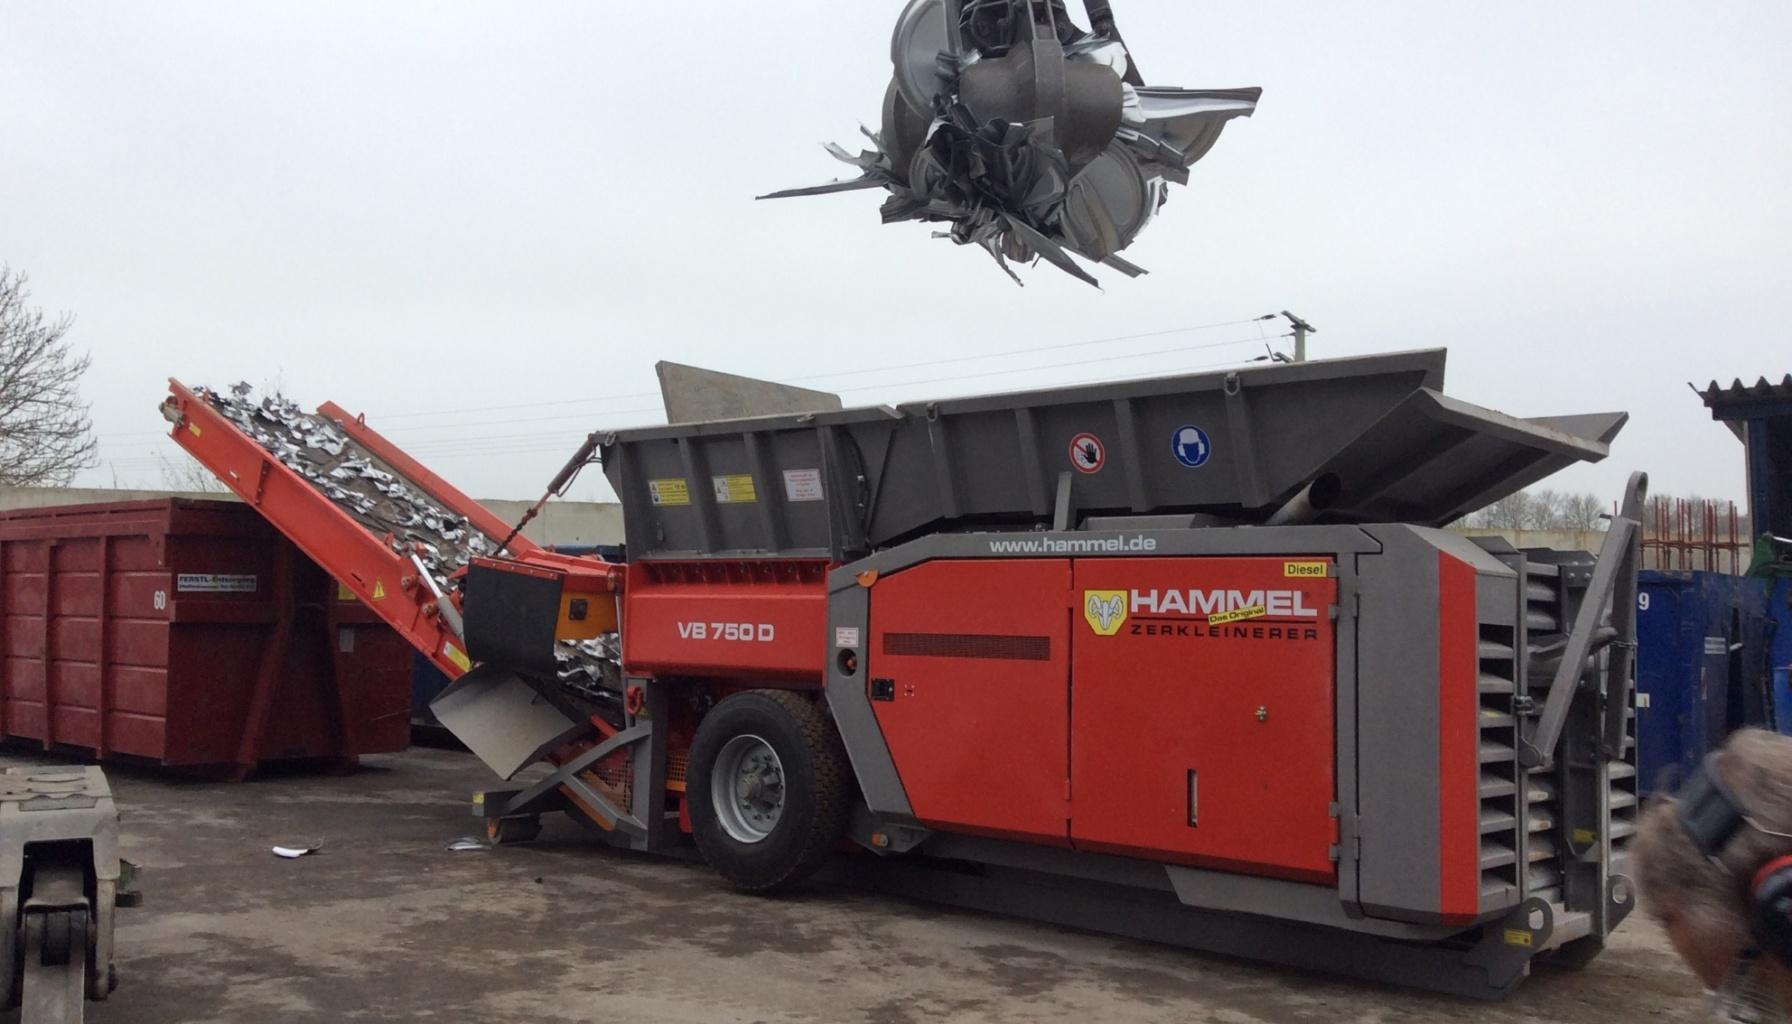 Hammel VB 750 D Shredder Image